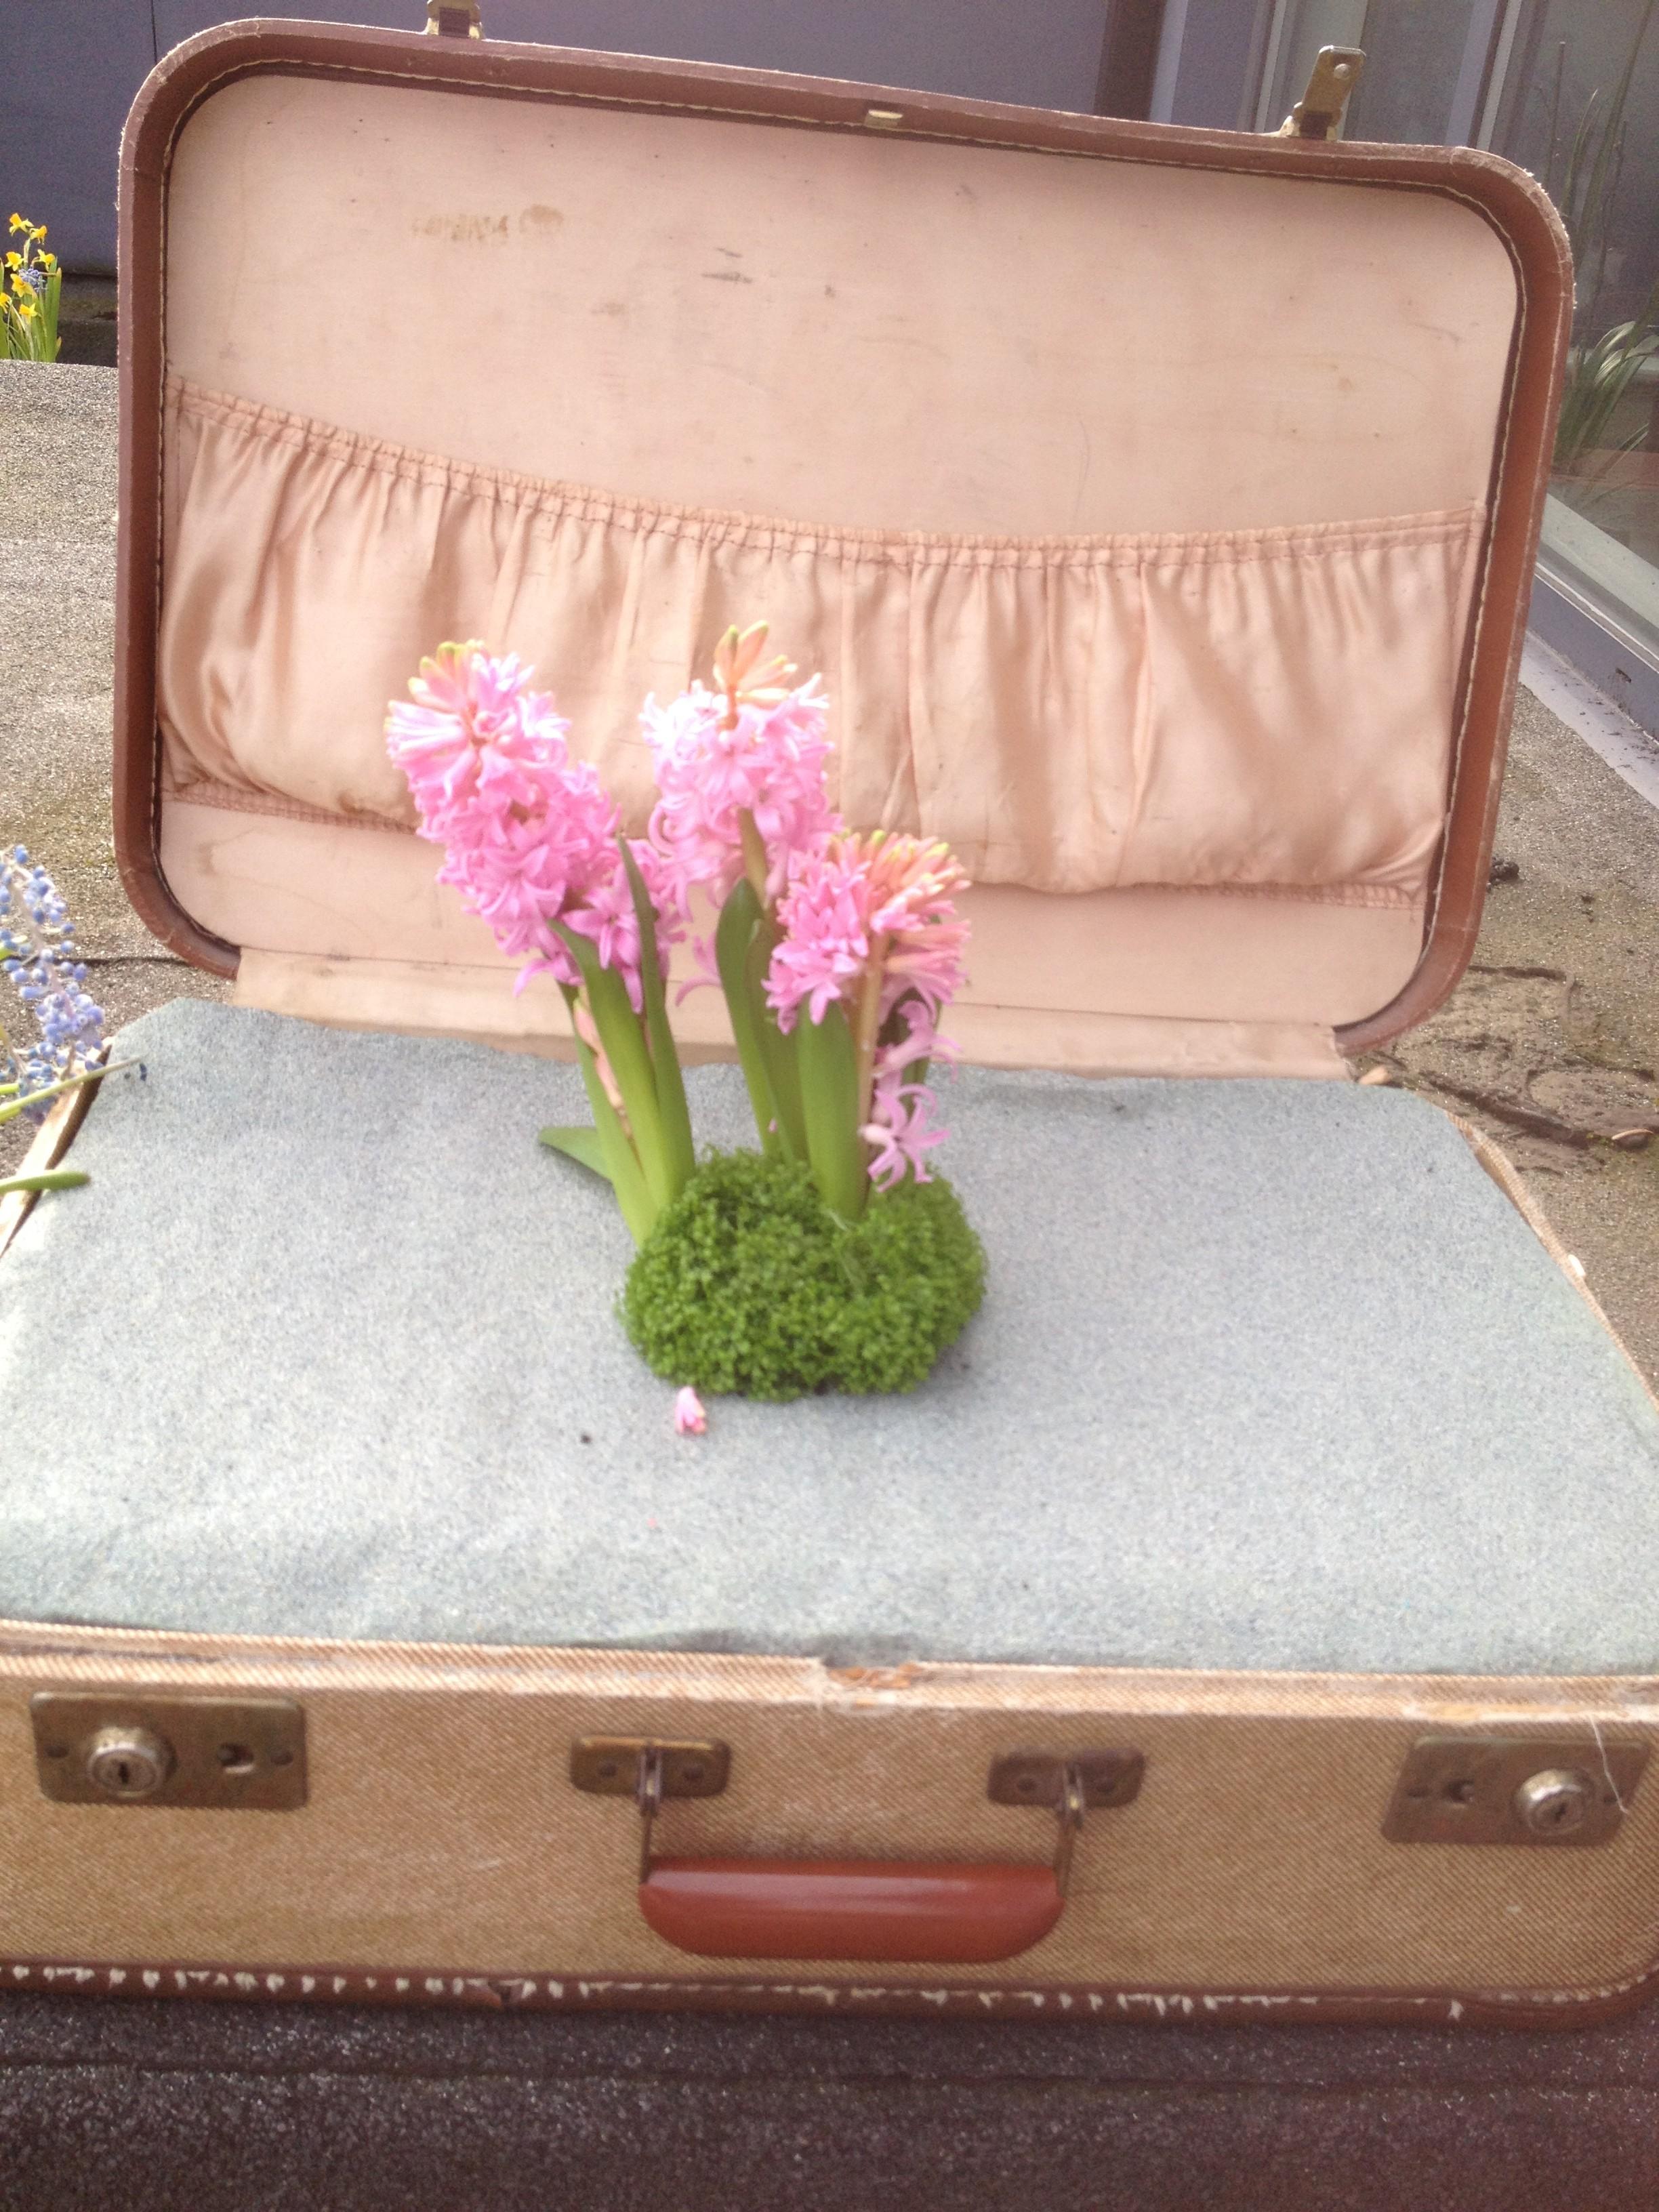 pothole garden in suitcase